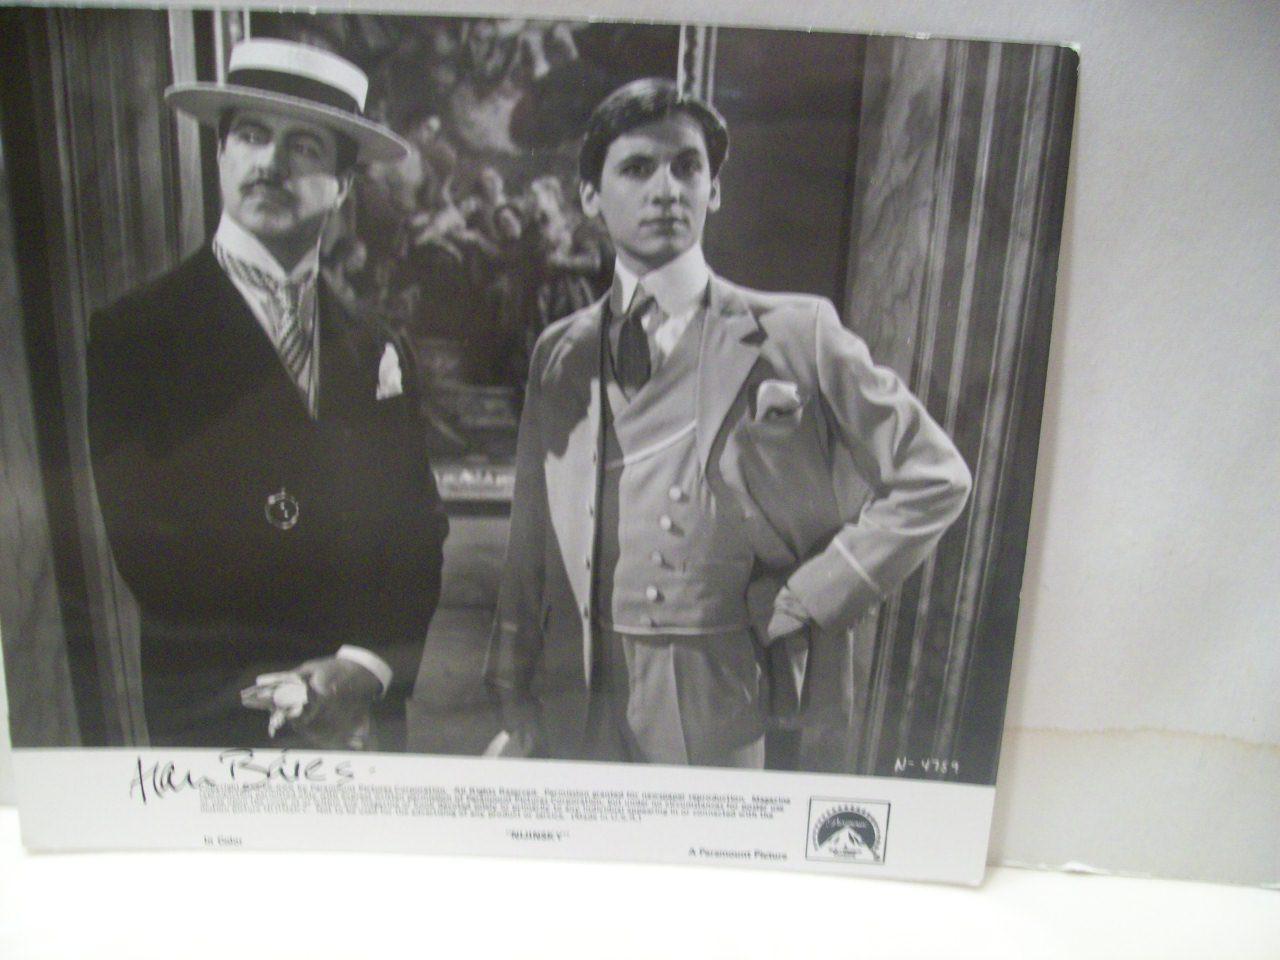 Bates, Alan Photo Signed Autograph Nijinsky 1980